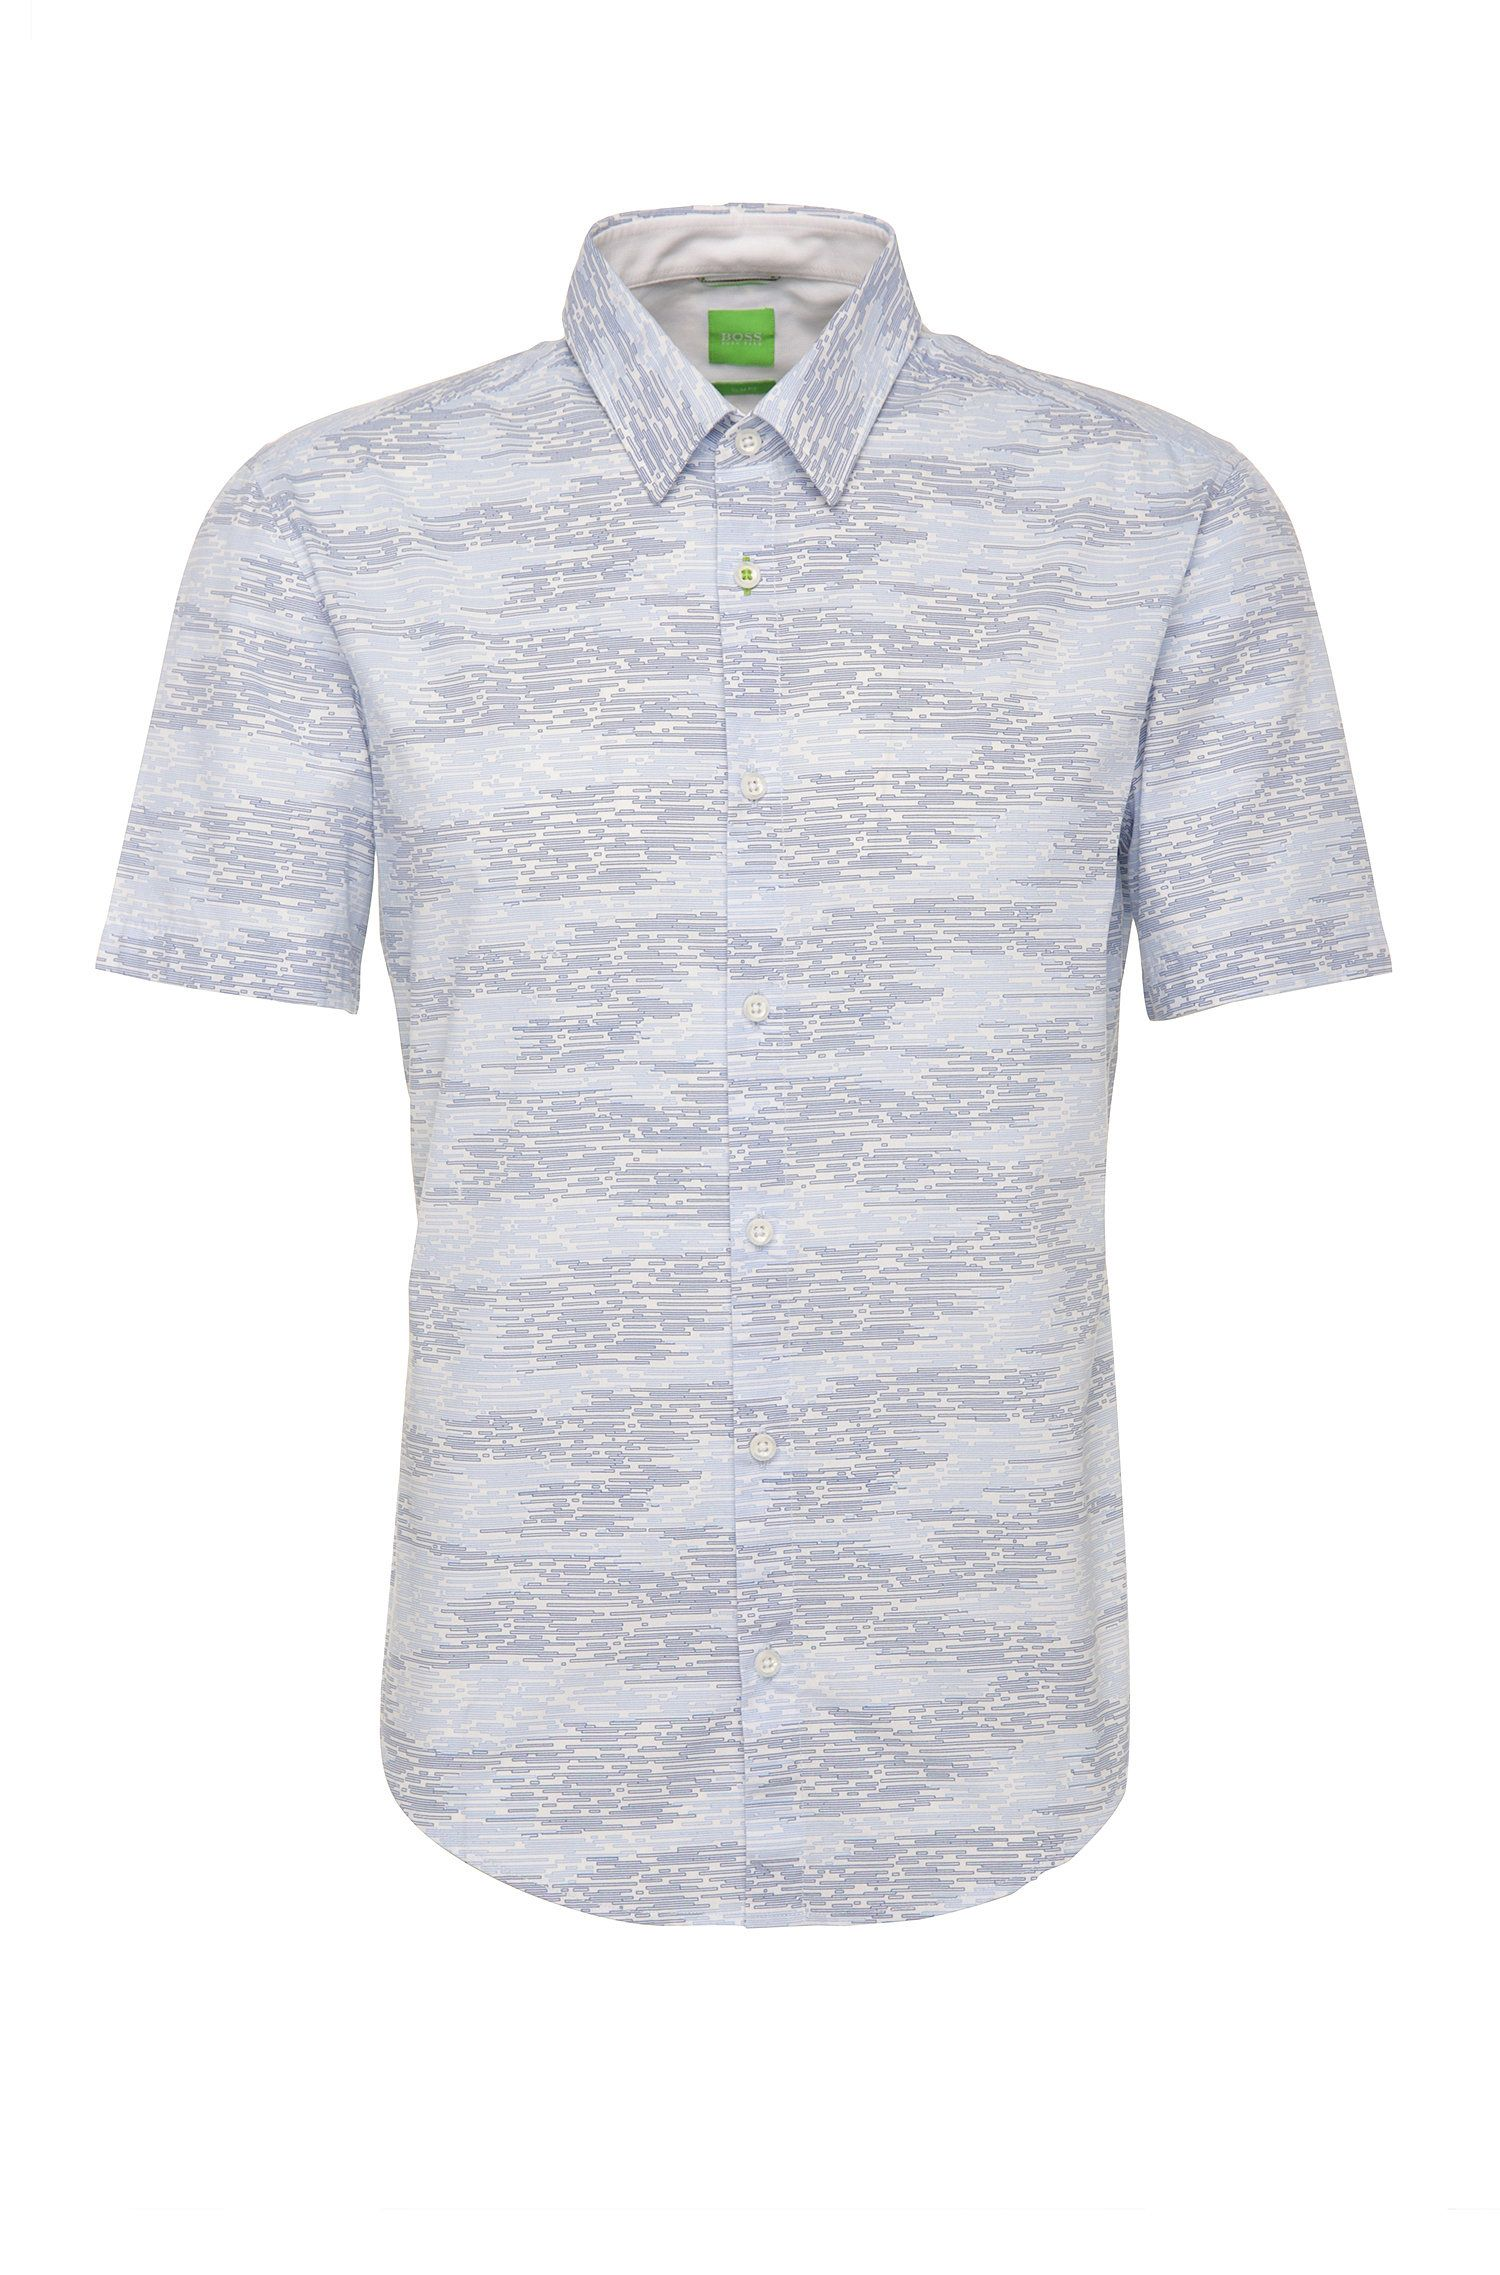 'Bhillo'   Slim Fit, Cotton Button Down Shirt